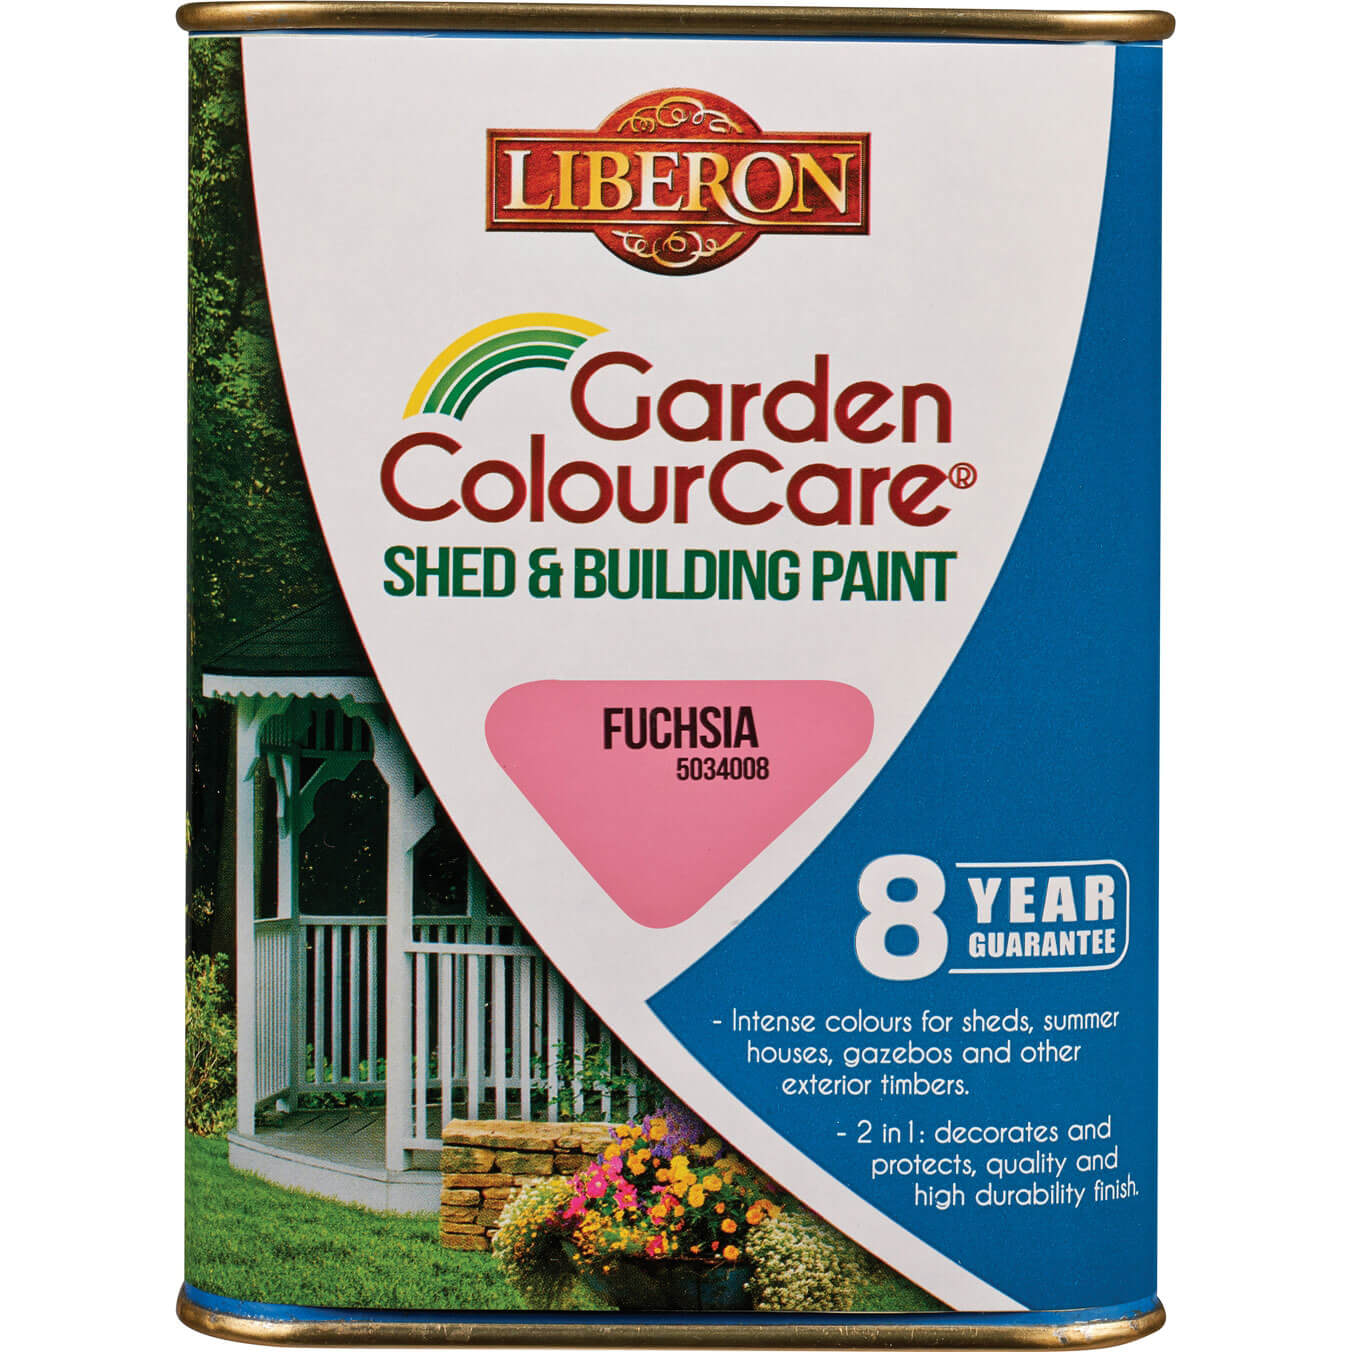 Liberon Shed & Building Exterior Paint Fuchsia 1l